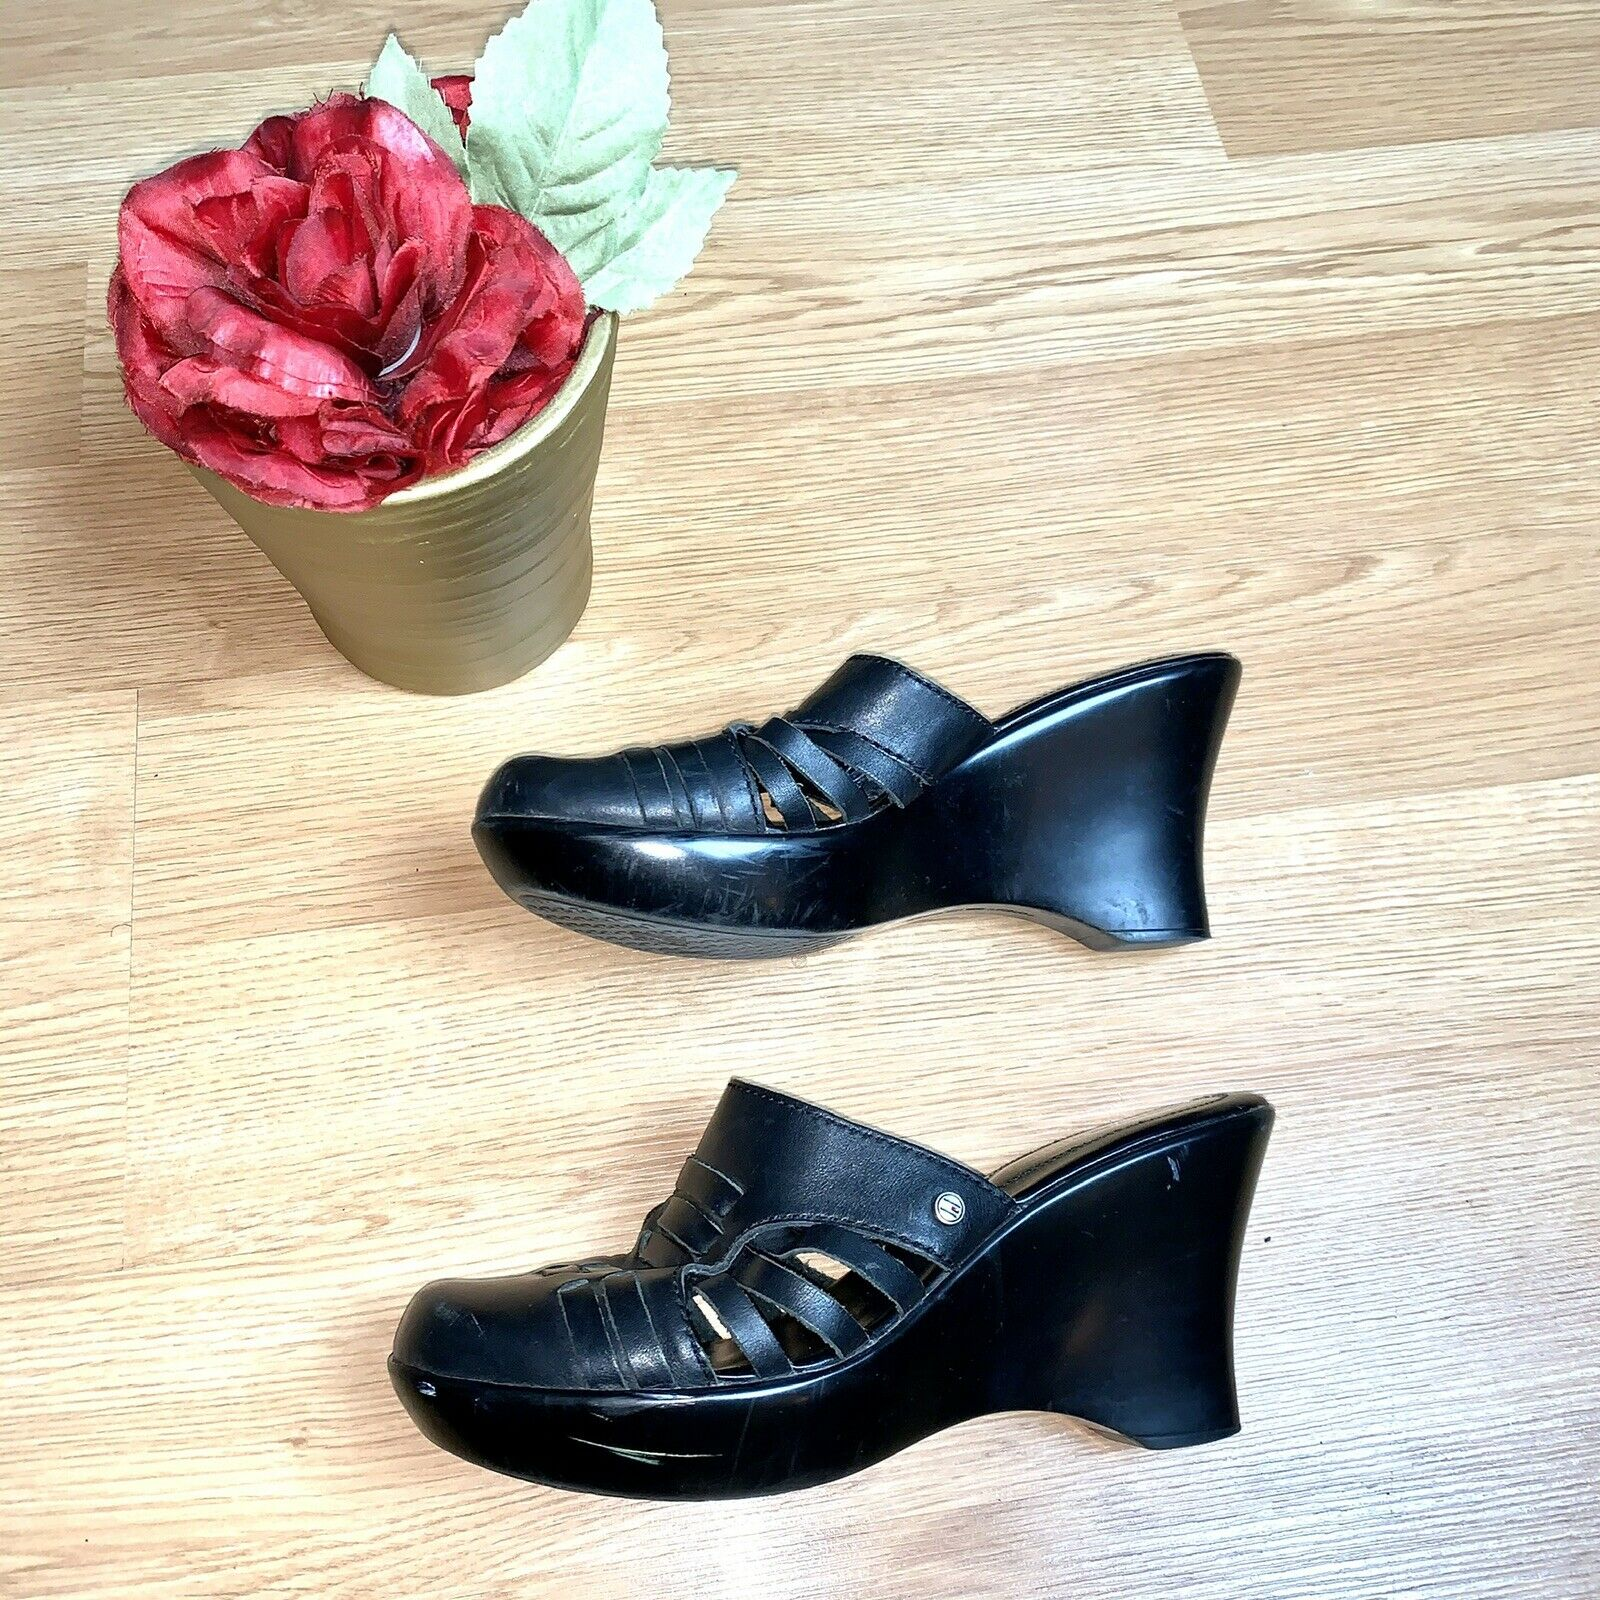 Tommy Hilfiger  Black Mule Leather Wedges Size 8 - image 5